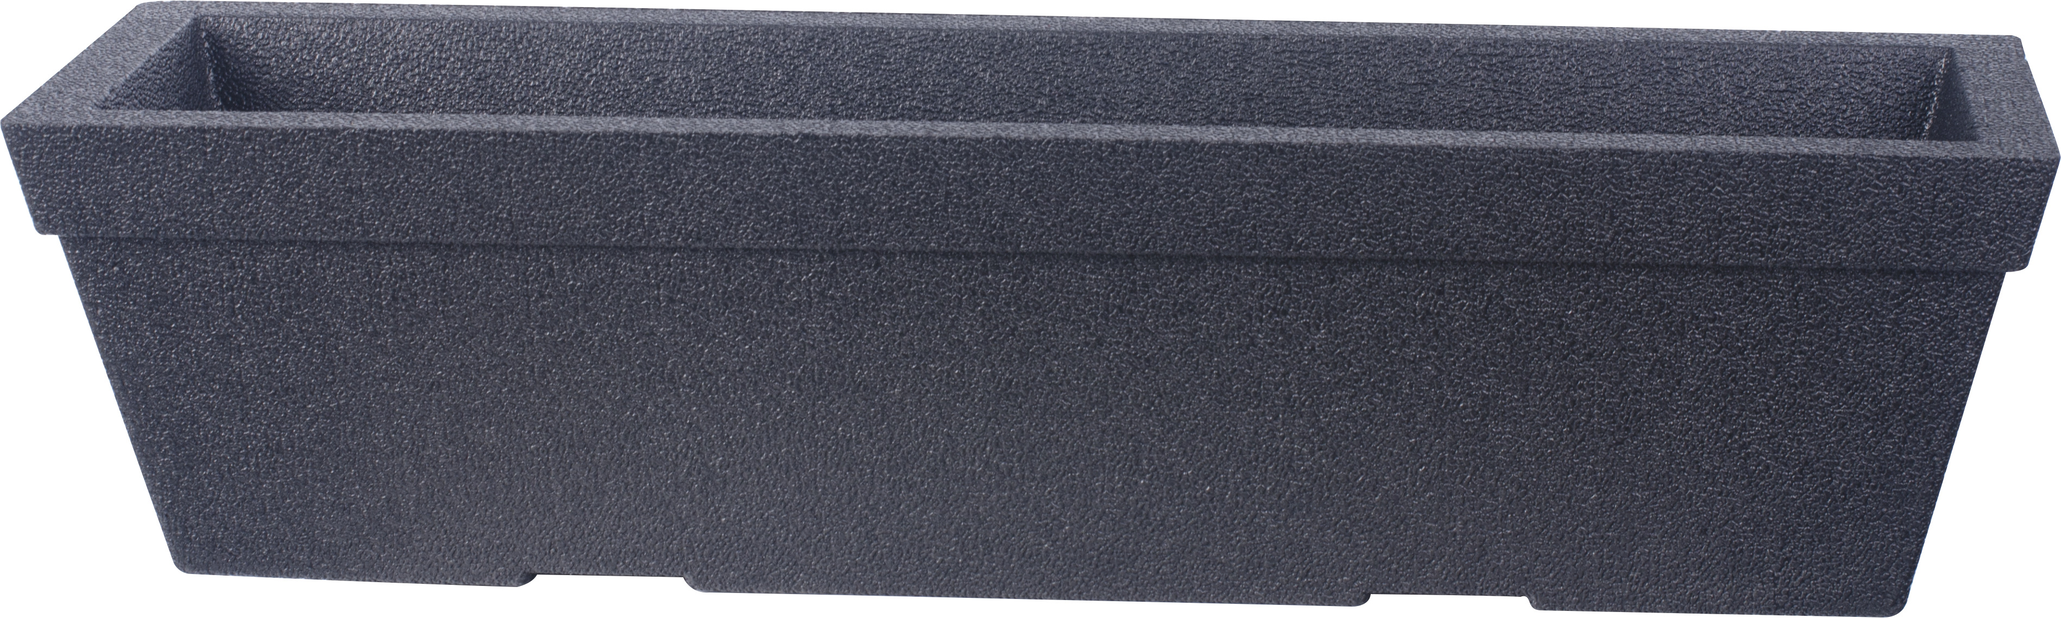 Balkonglåda Milla 76 cm svart